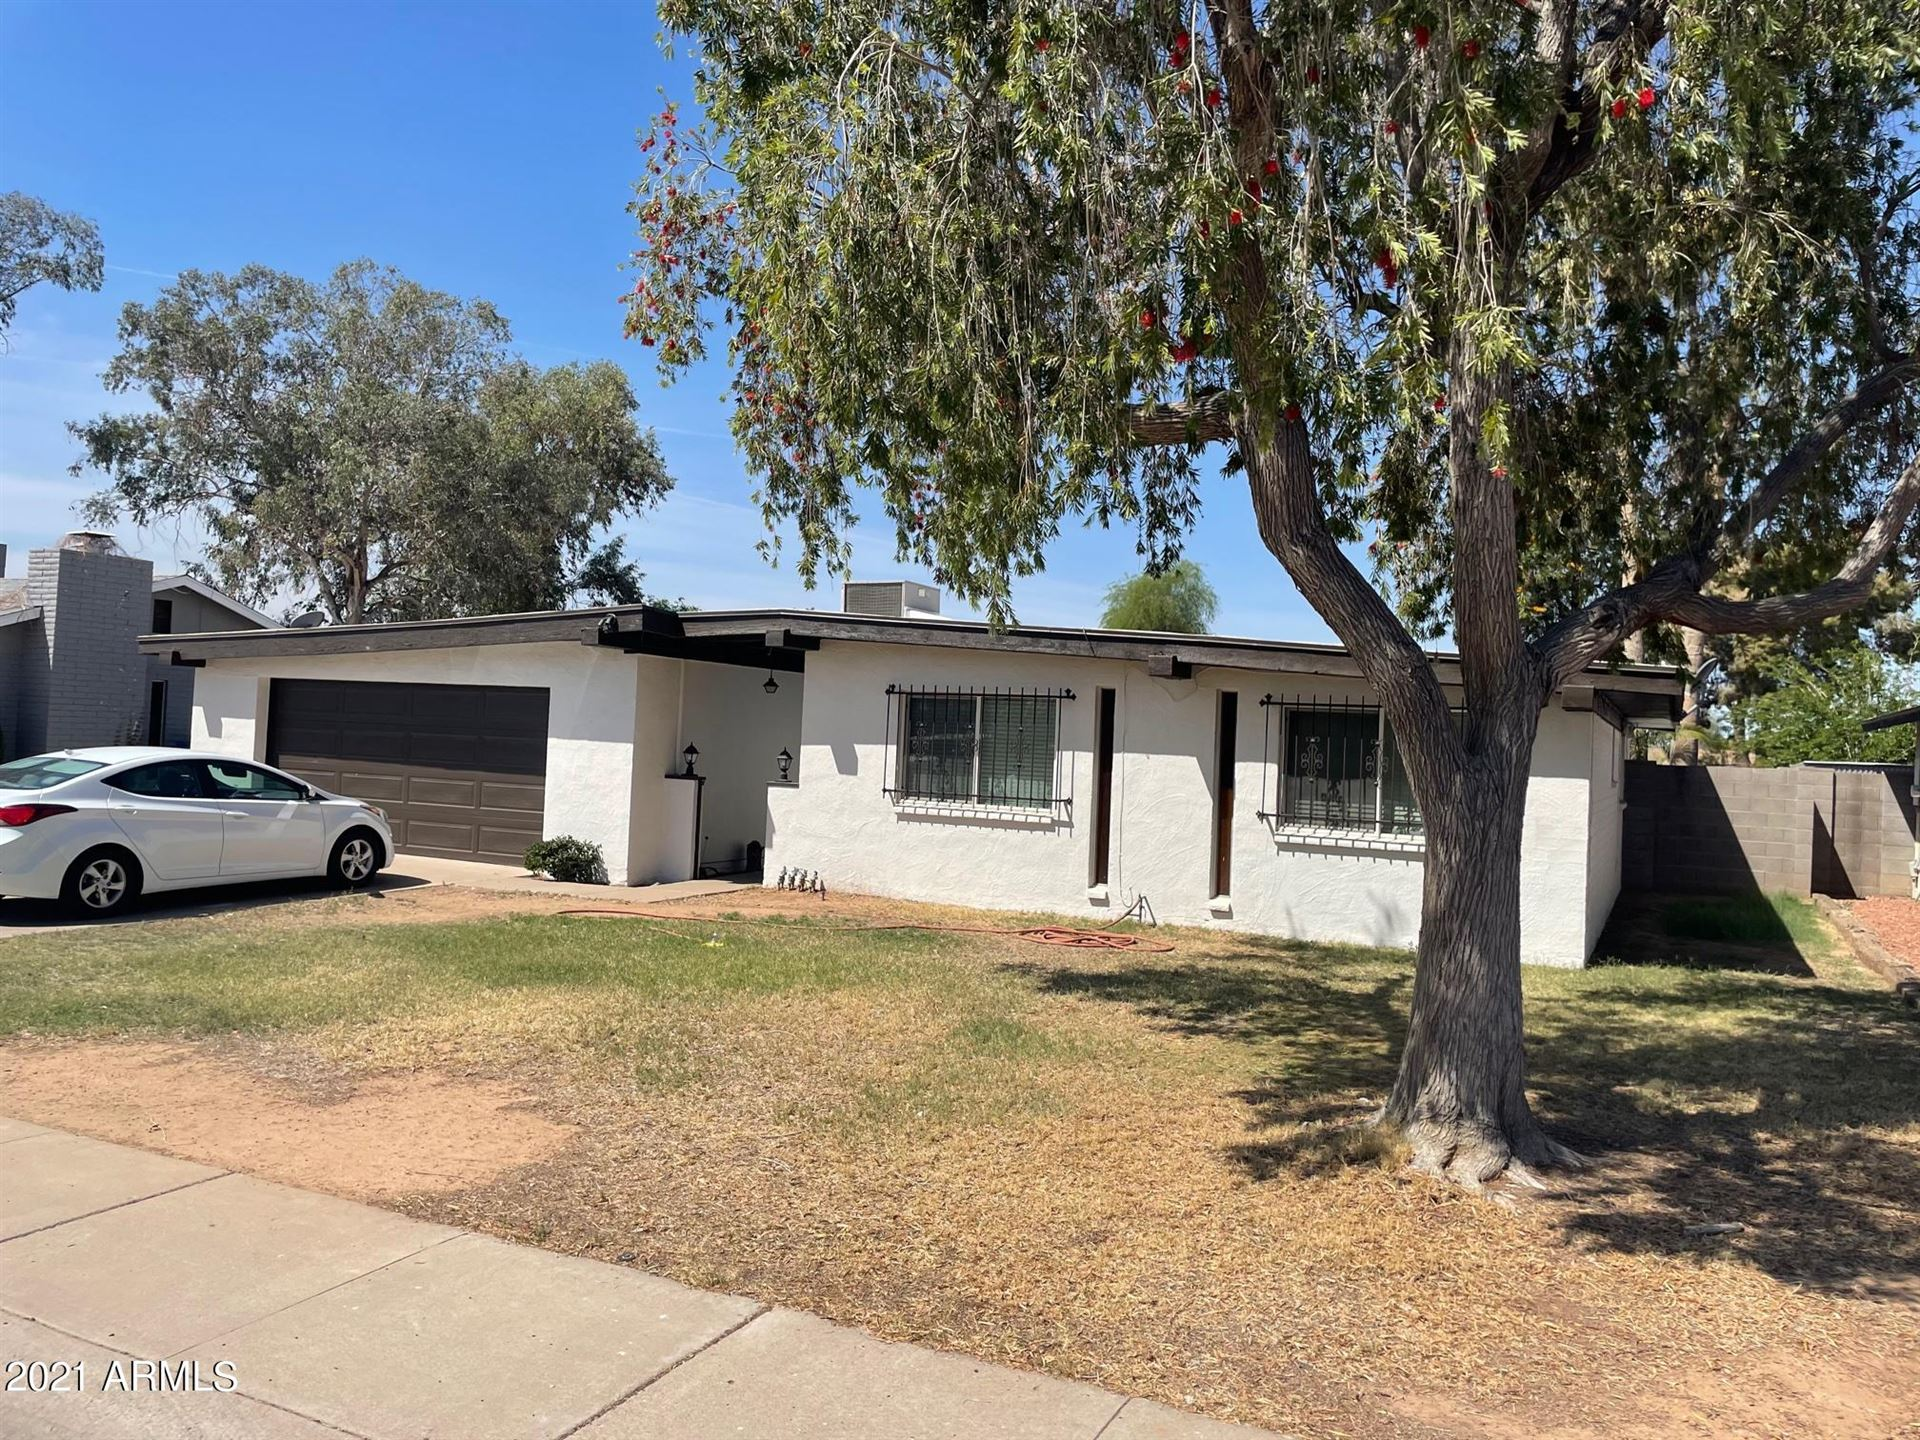 12632 N 21ST Drive, Phoenix, AZ 85029 - MLS#: 6221530